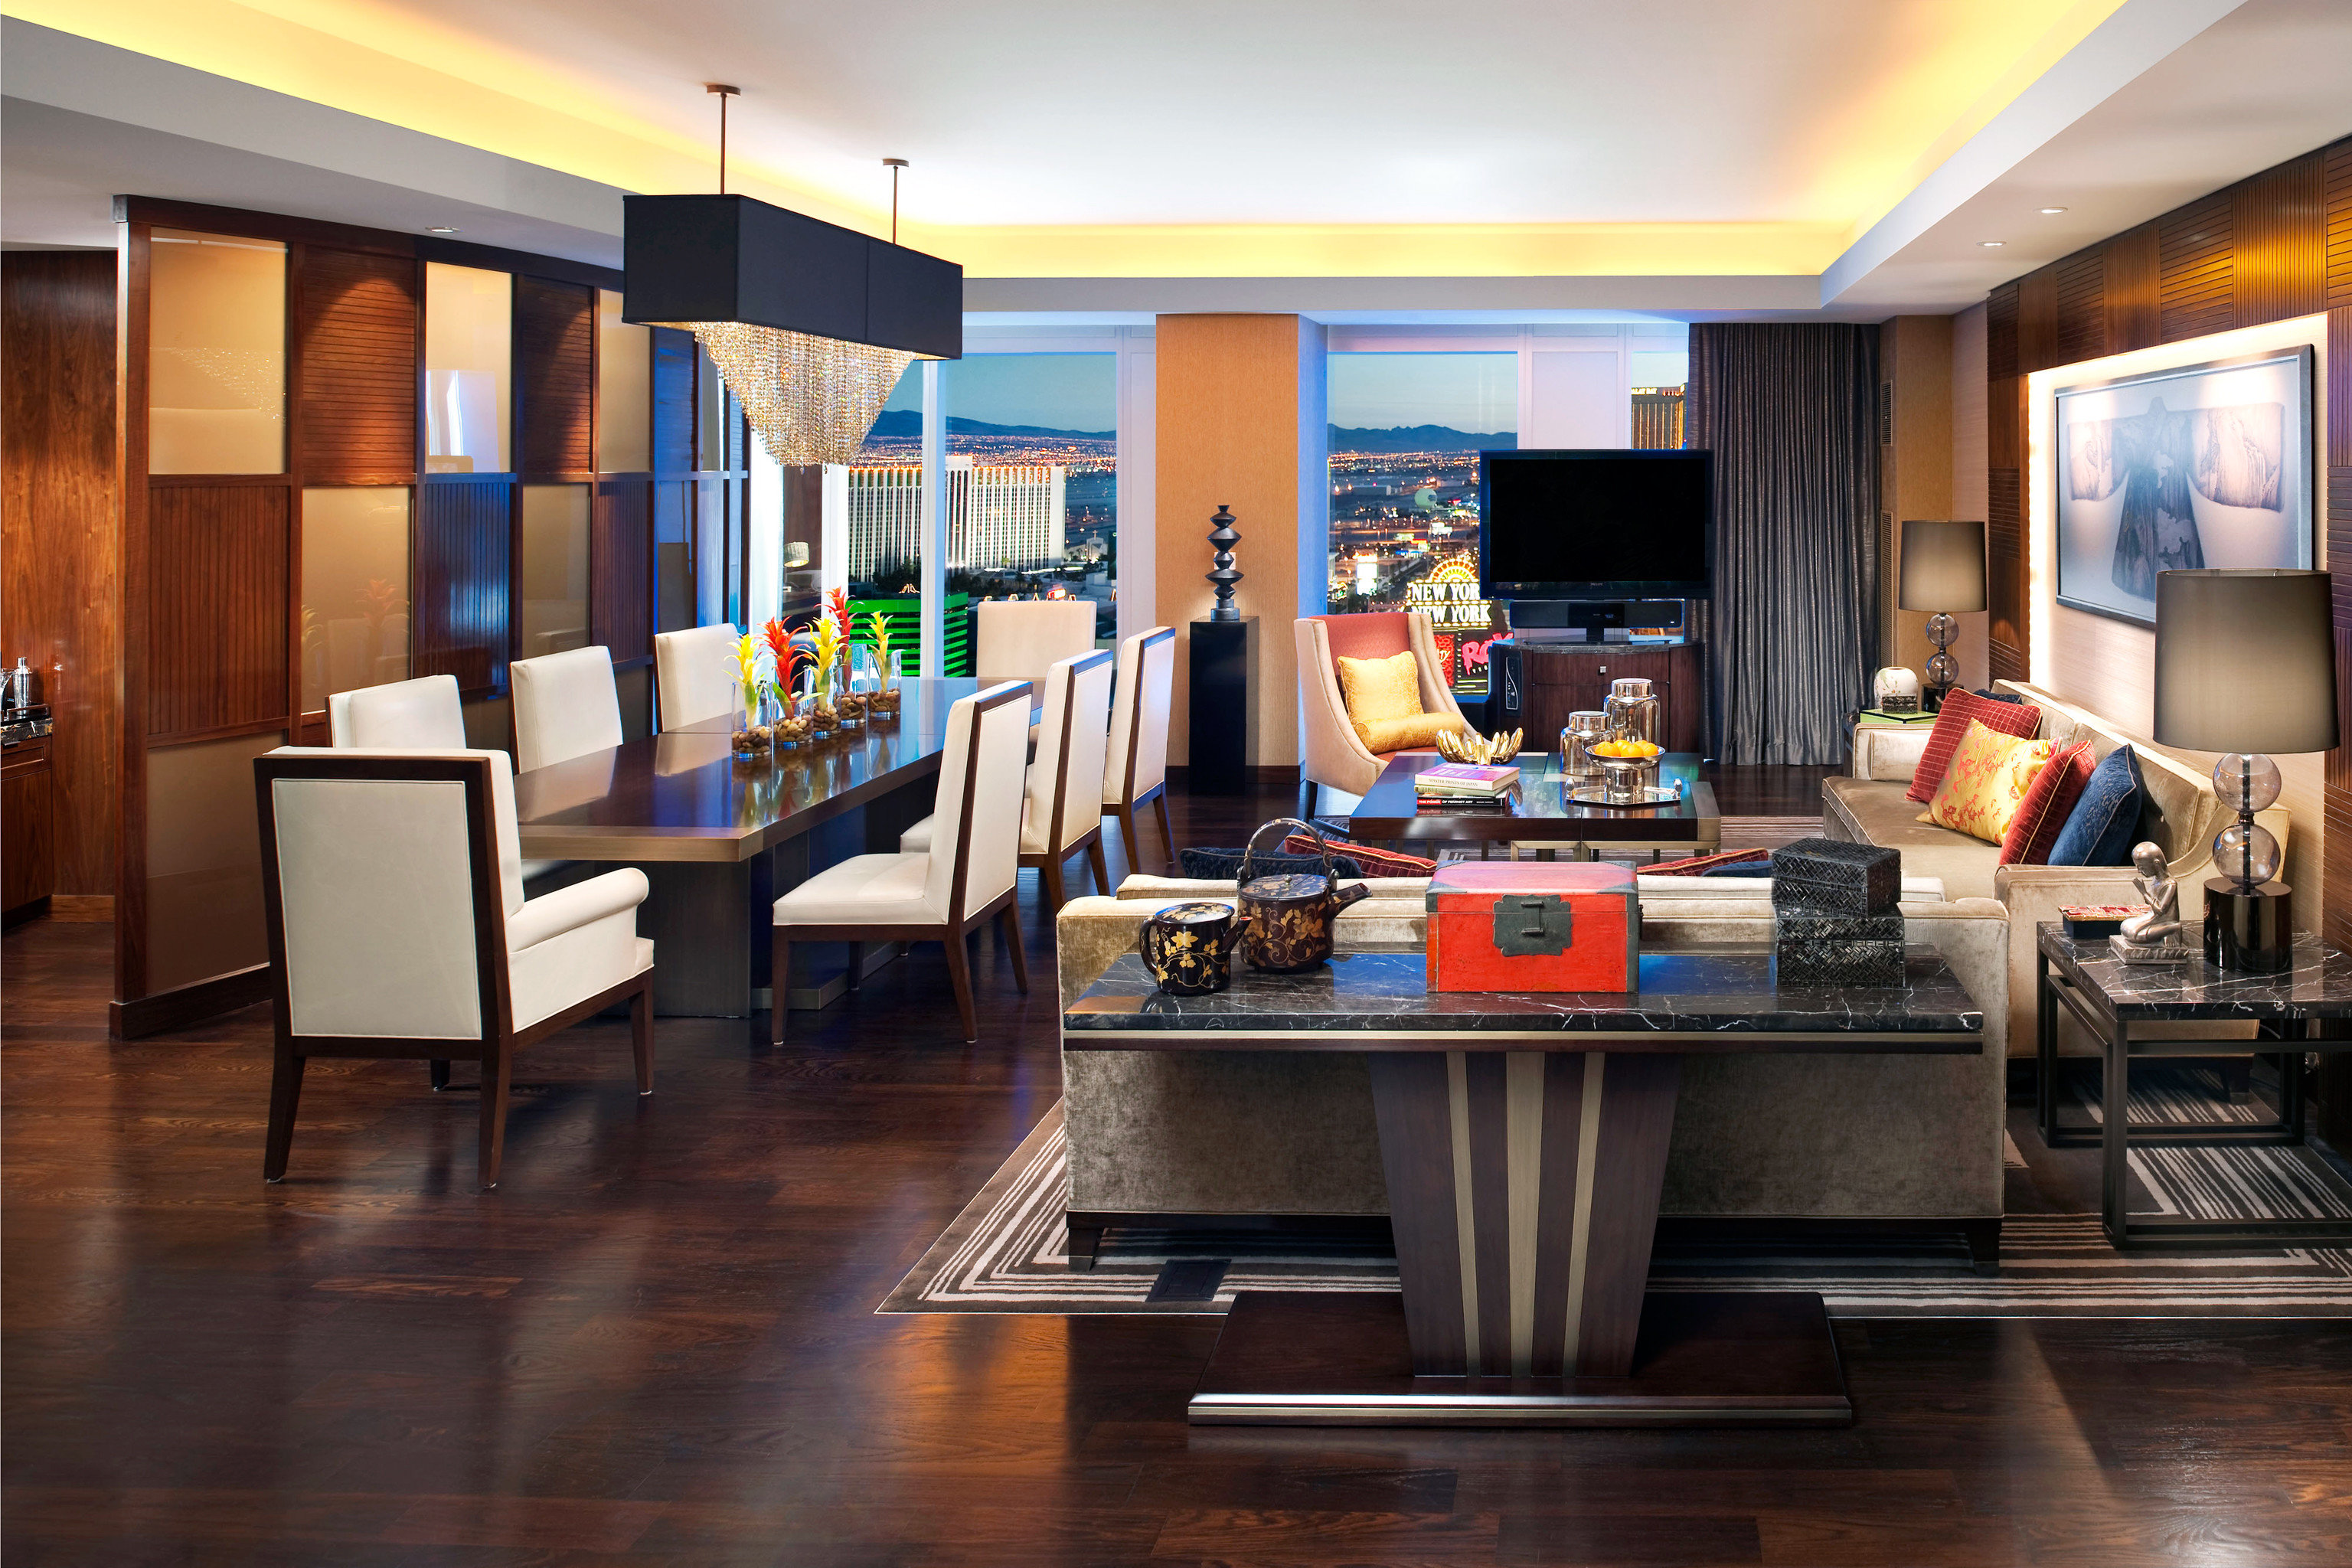 Dining Elegant Luxury Resort property recreation room living room home Lobby Suite condominium Modern